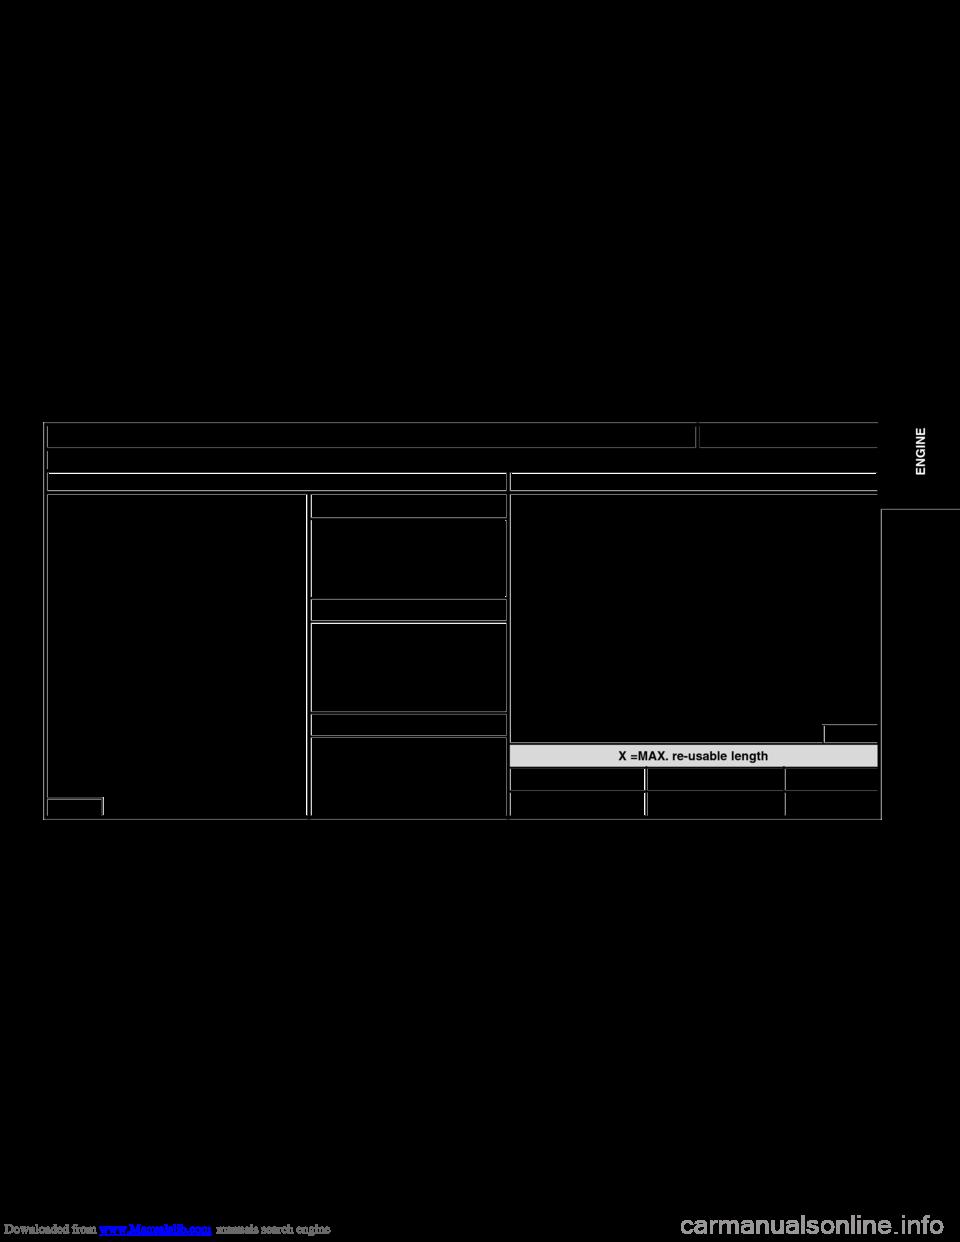 Citroen XSARA 2004 1.G Workshop Manual, Page 101